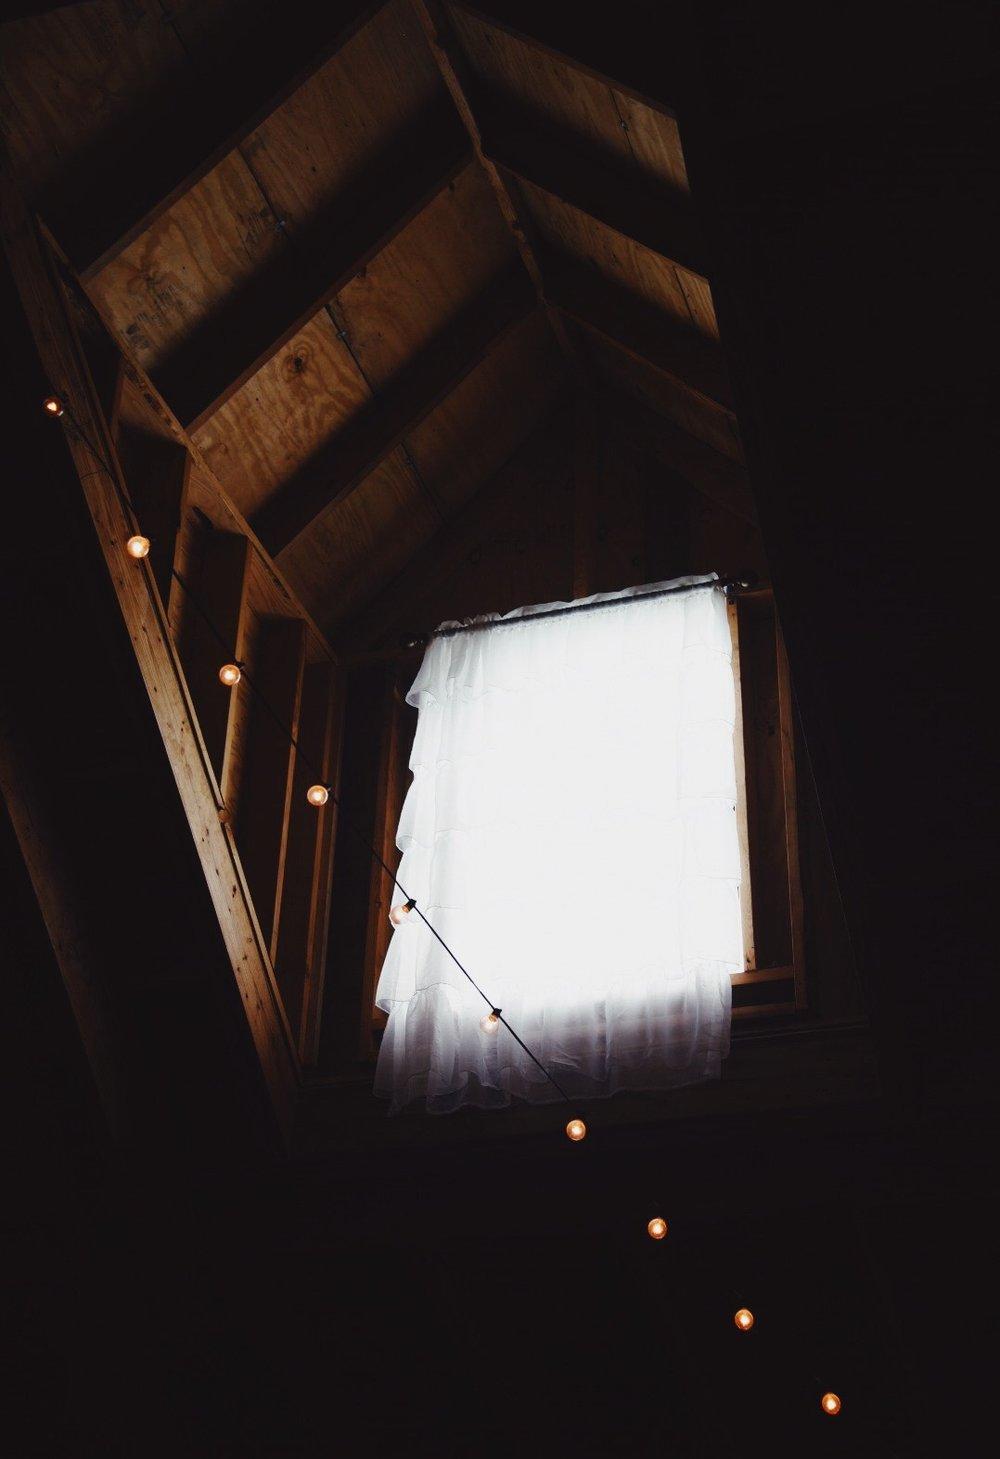 wedding-barn-inside-window.jpg